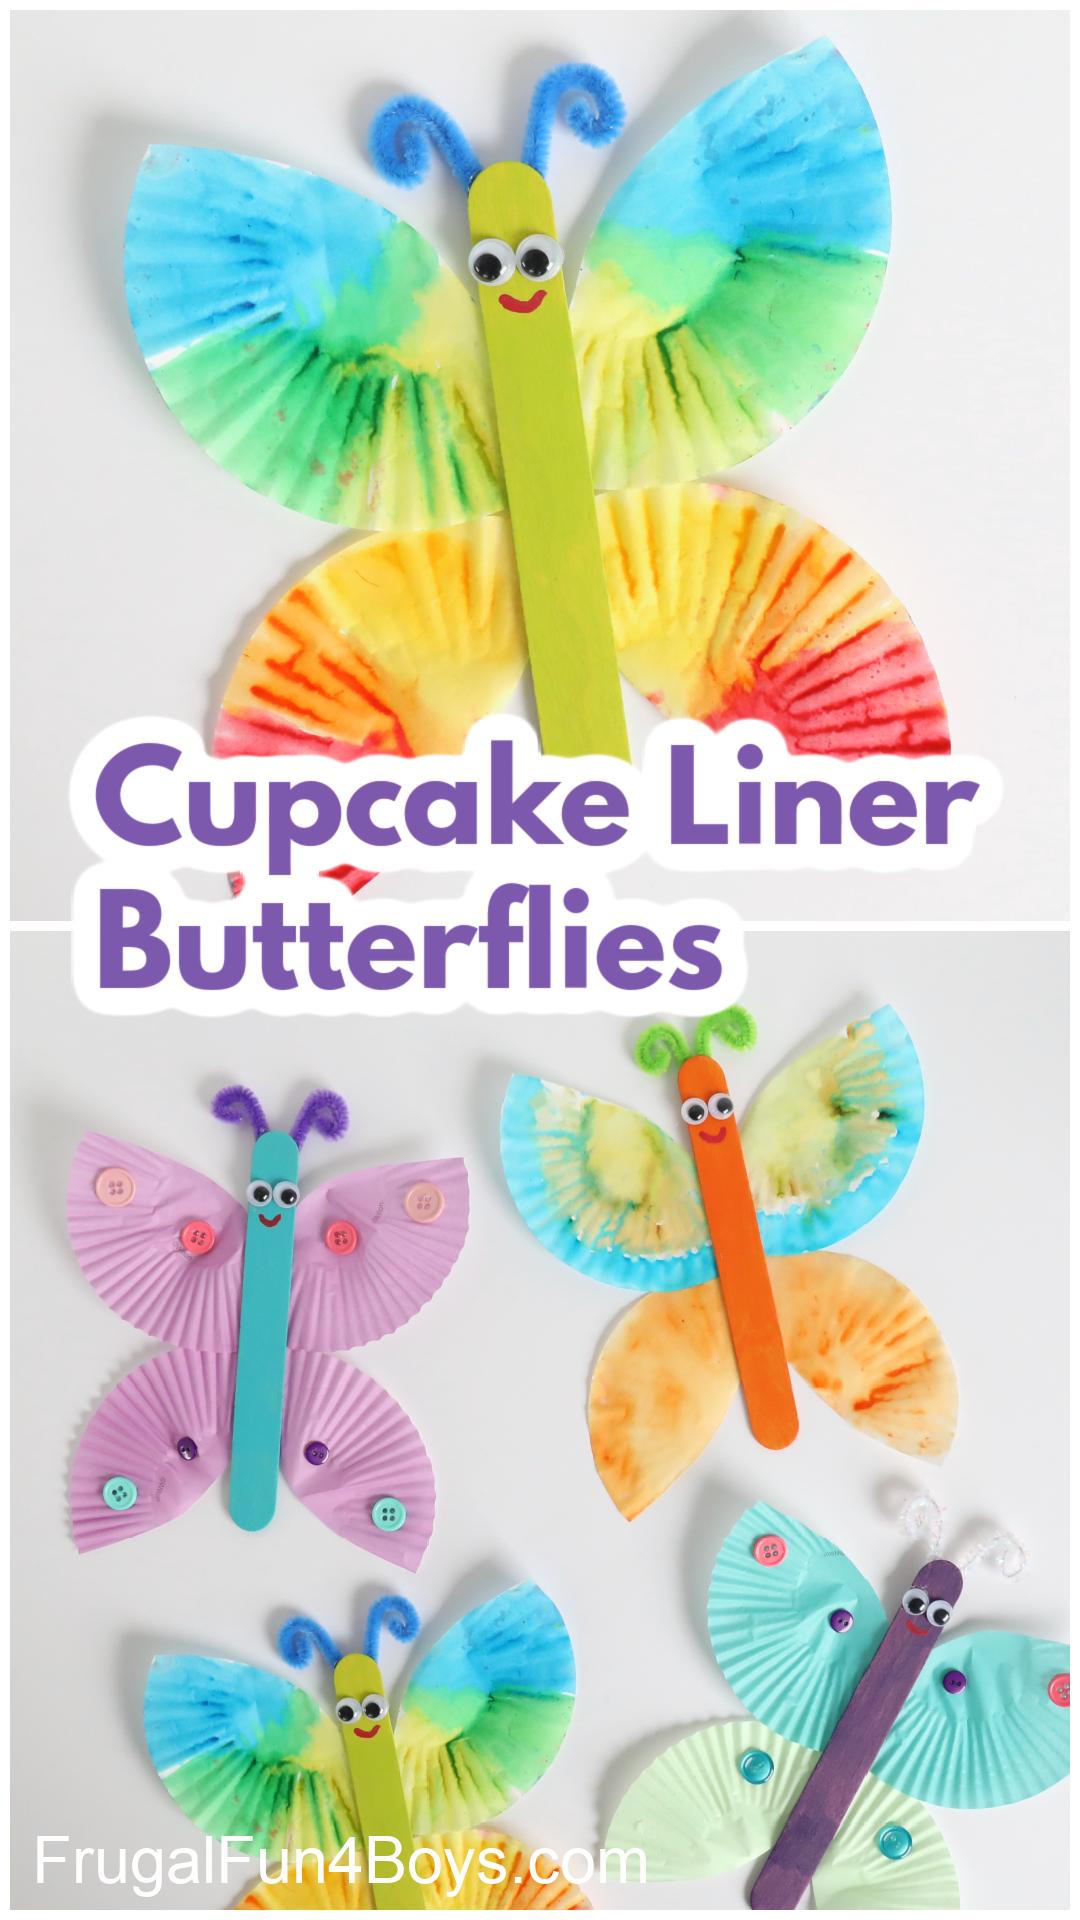 Cupcake Liner Butterflies